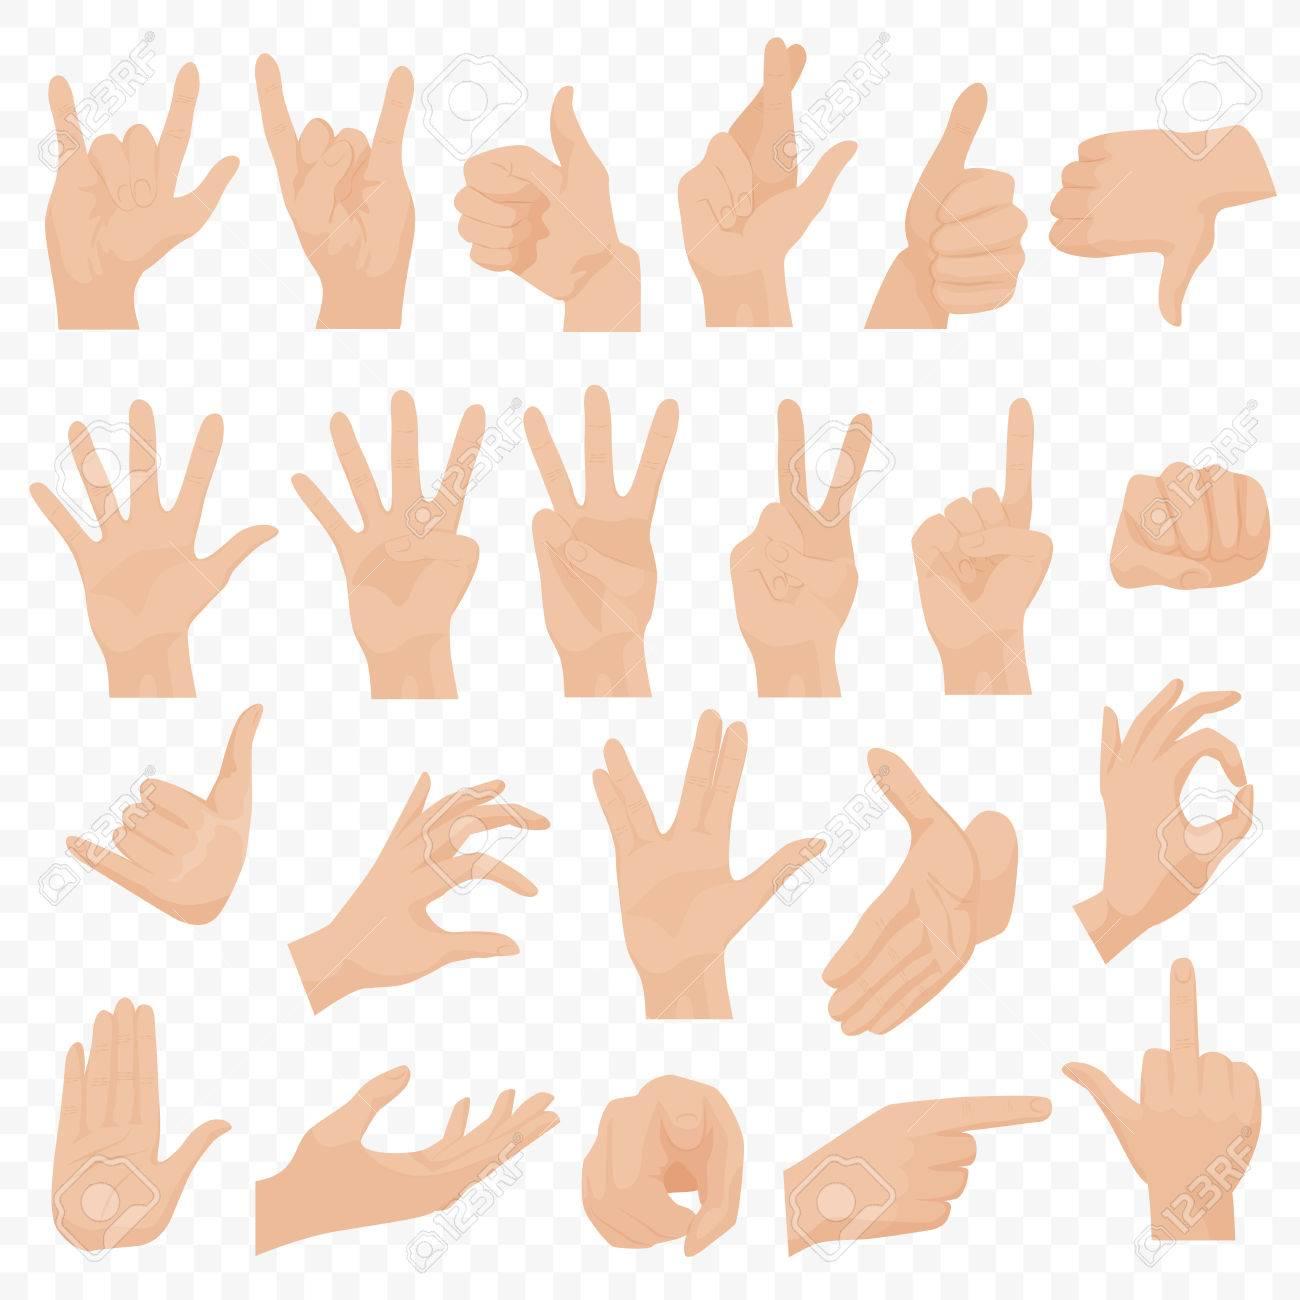 Realistic human hands icons and symbols set emoji hand icons realistic human hands icons and symbols set emoji hand icons different gestures hands biocorpaavc